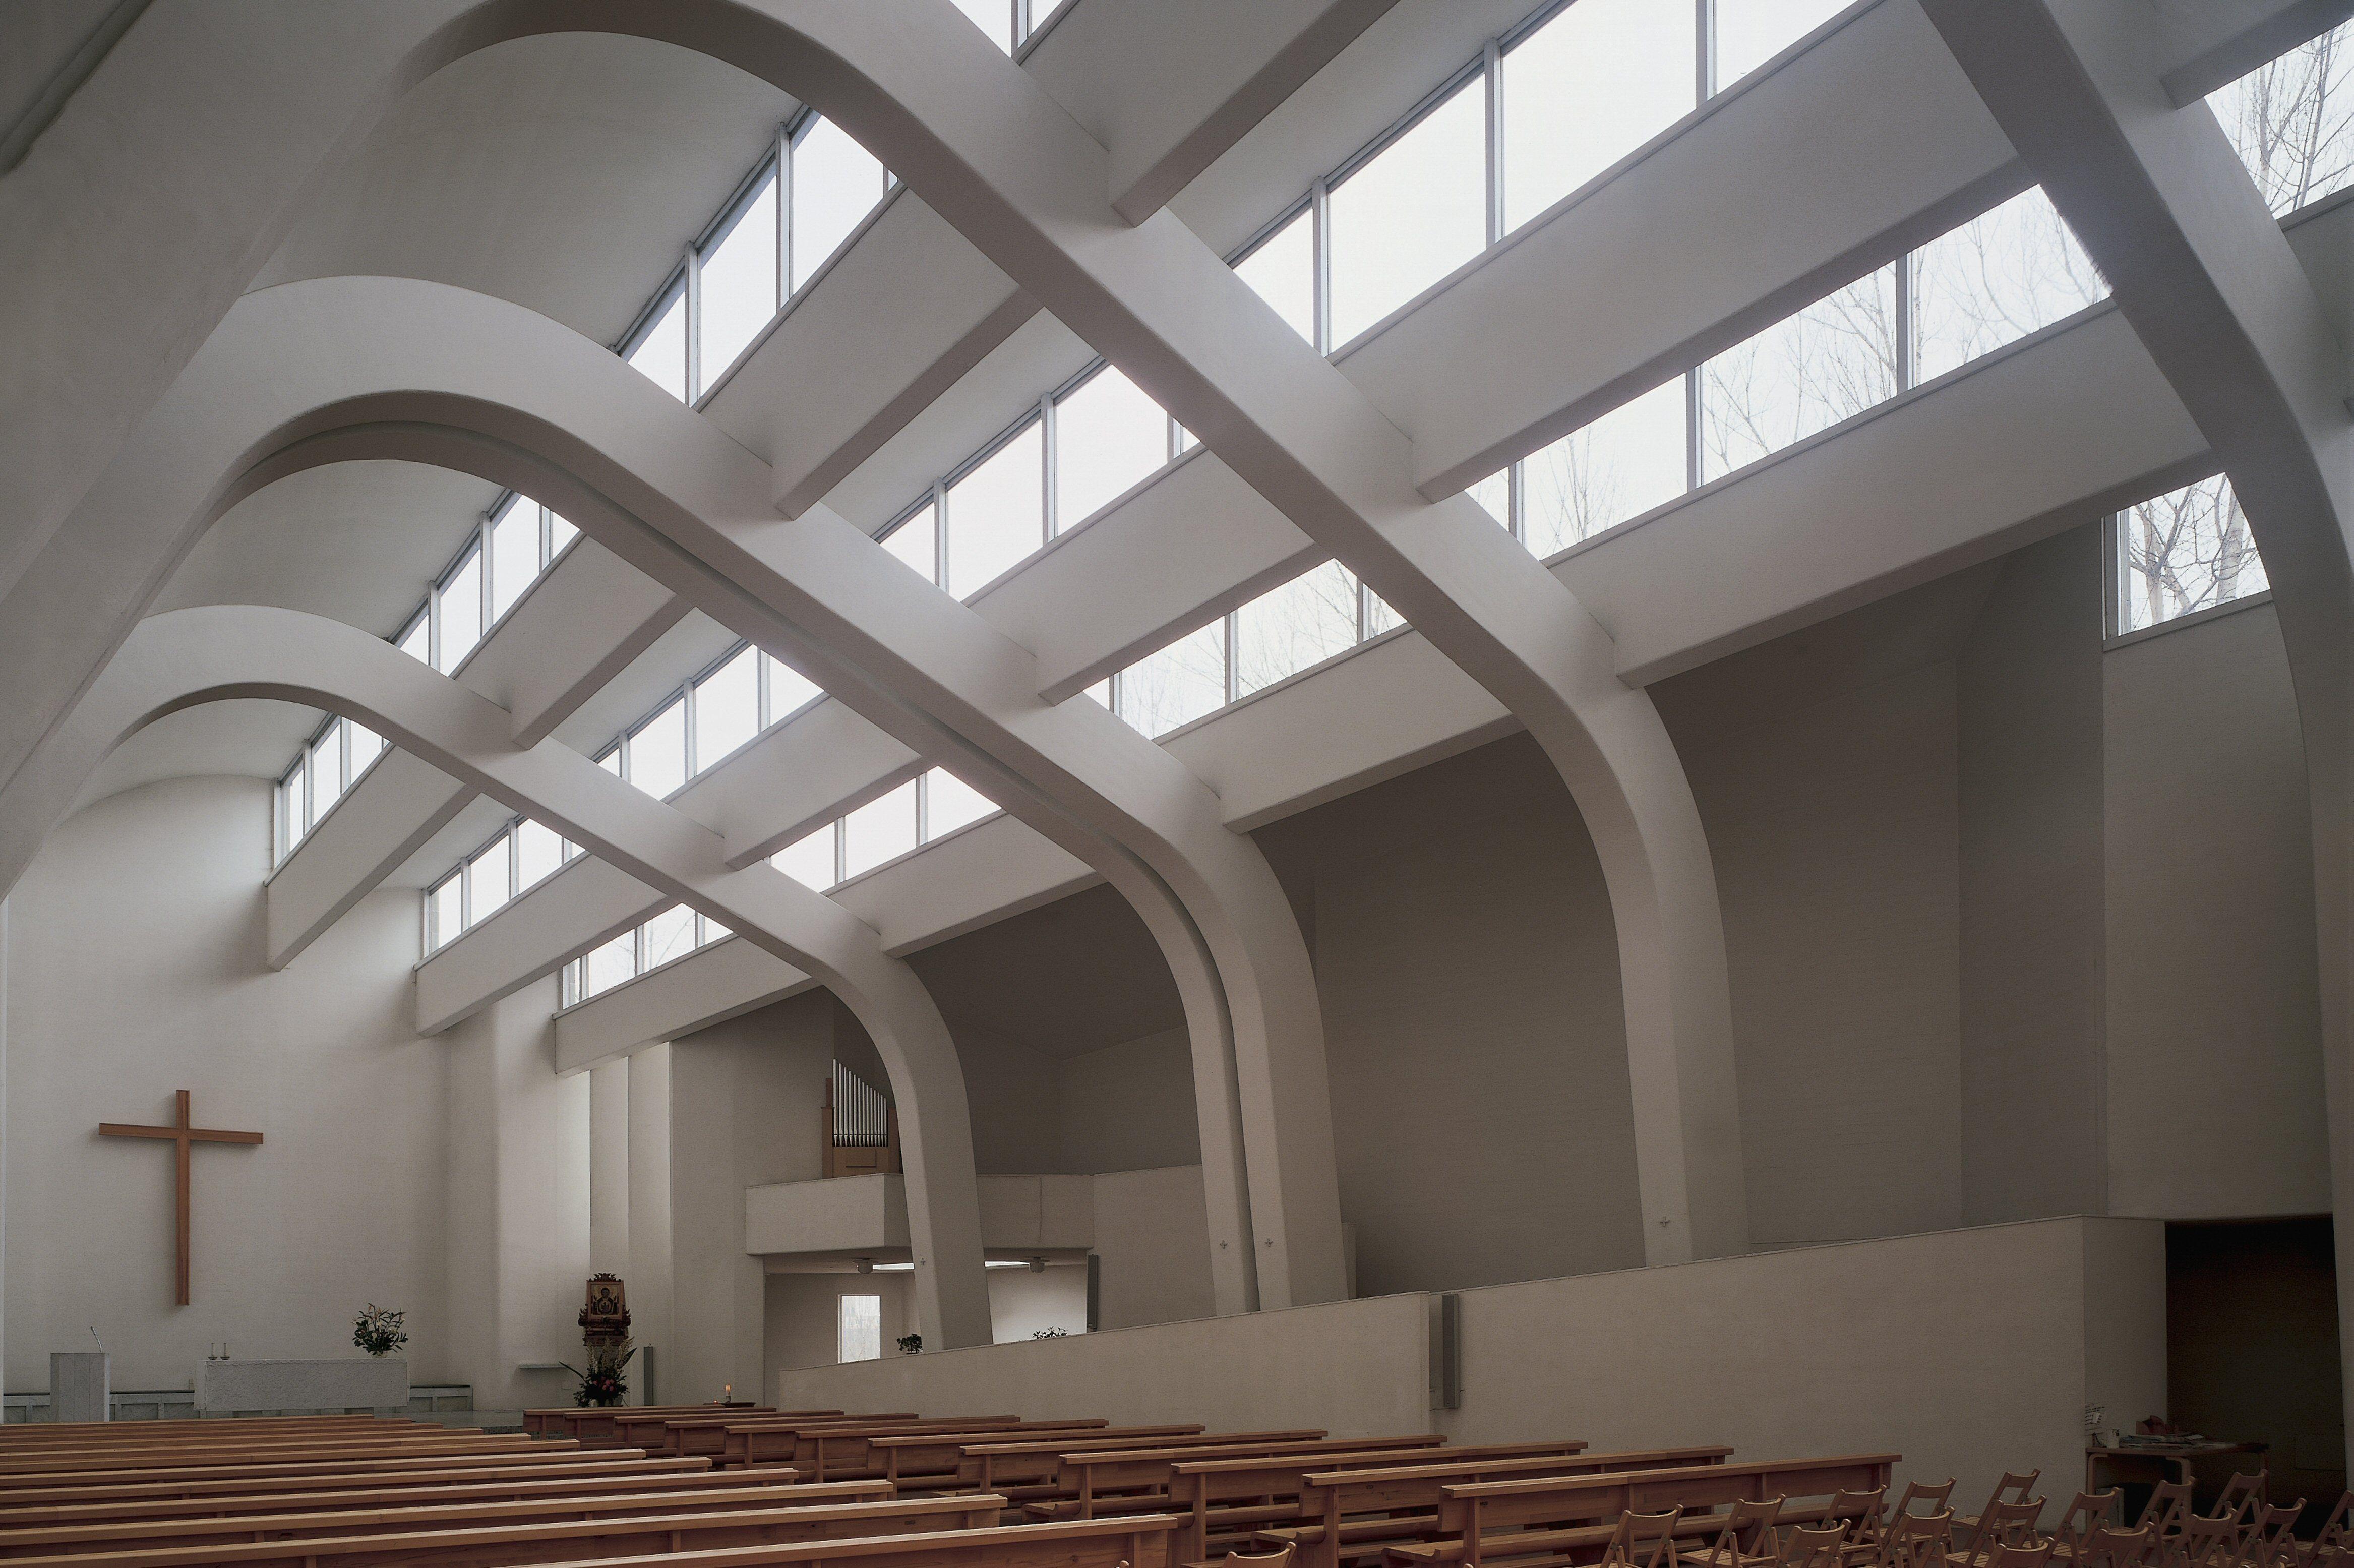 Interior of Church of the Assumption of Mary, Riola di Vergato, Emilia-Romagna, Italy